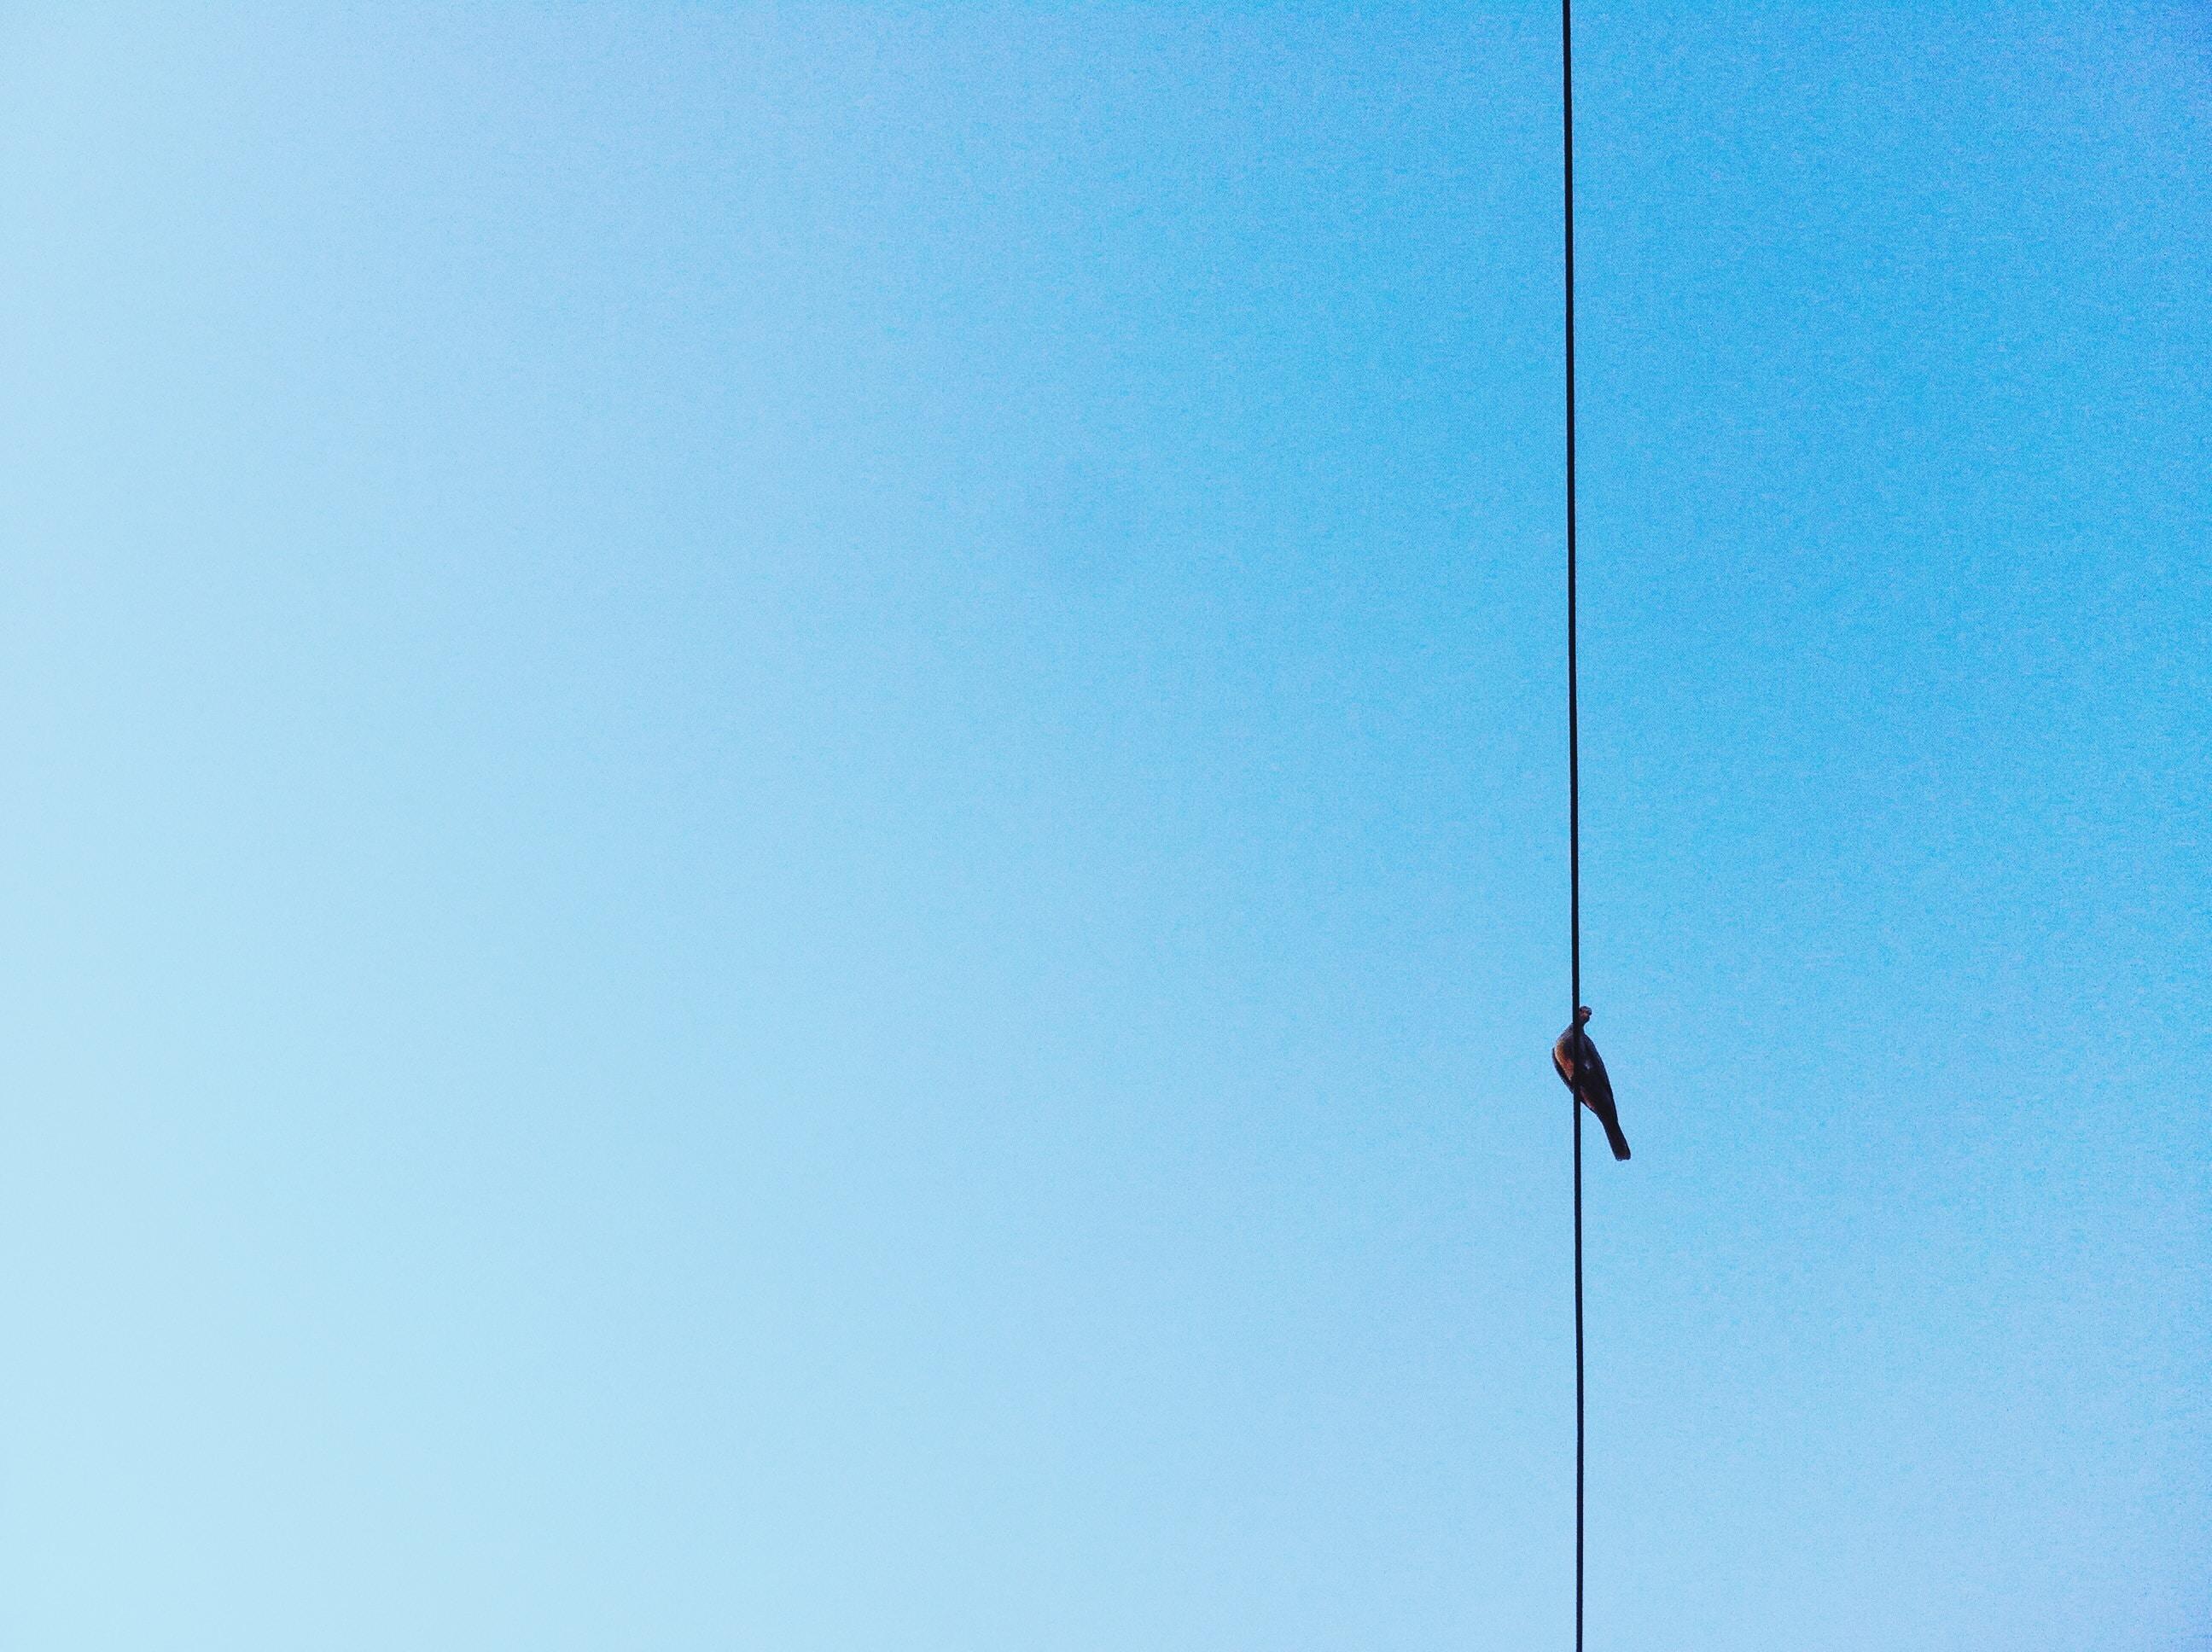 black bird on wire under clear sky